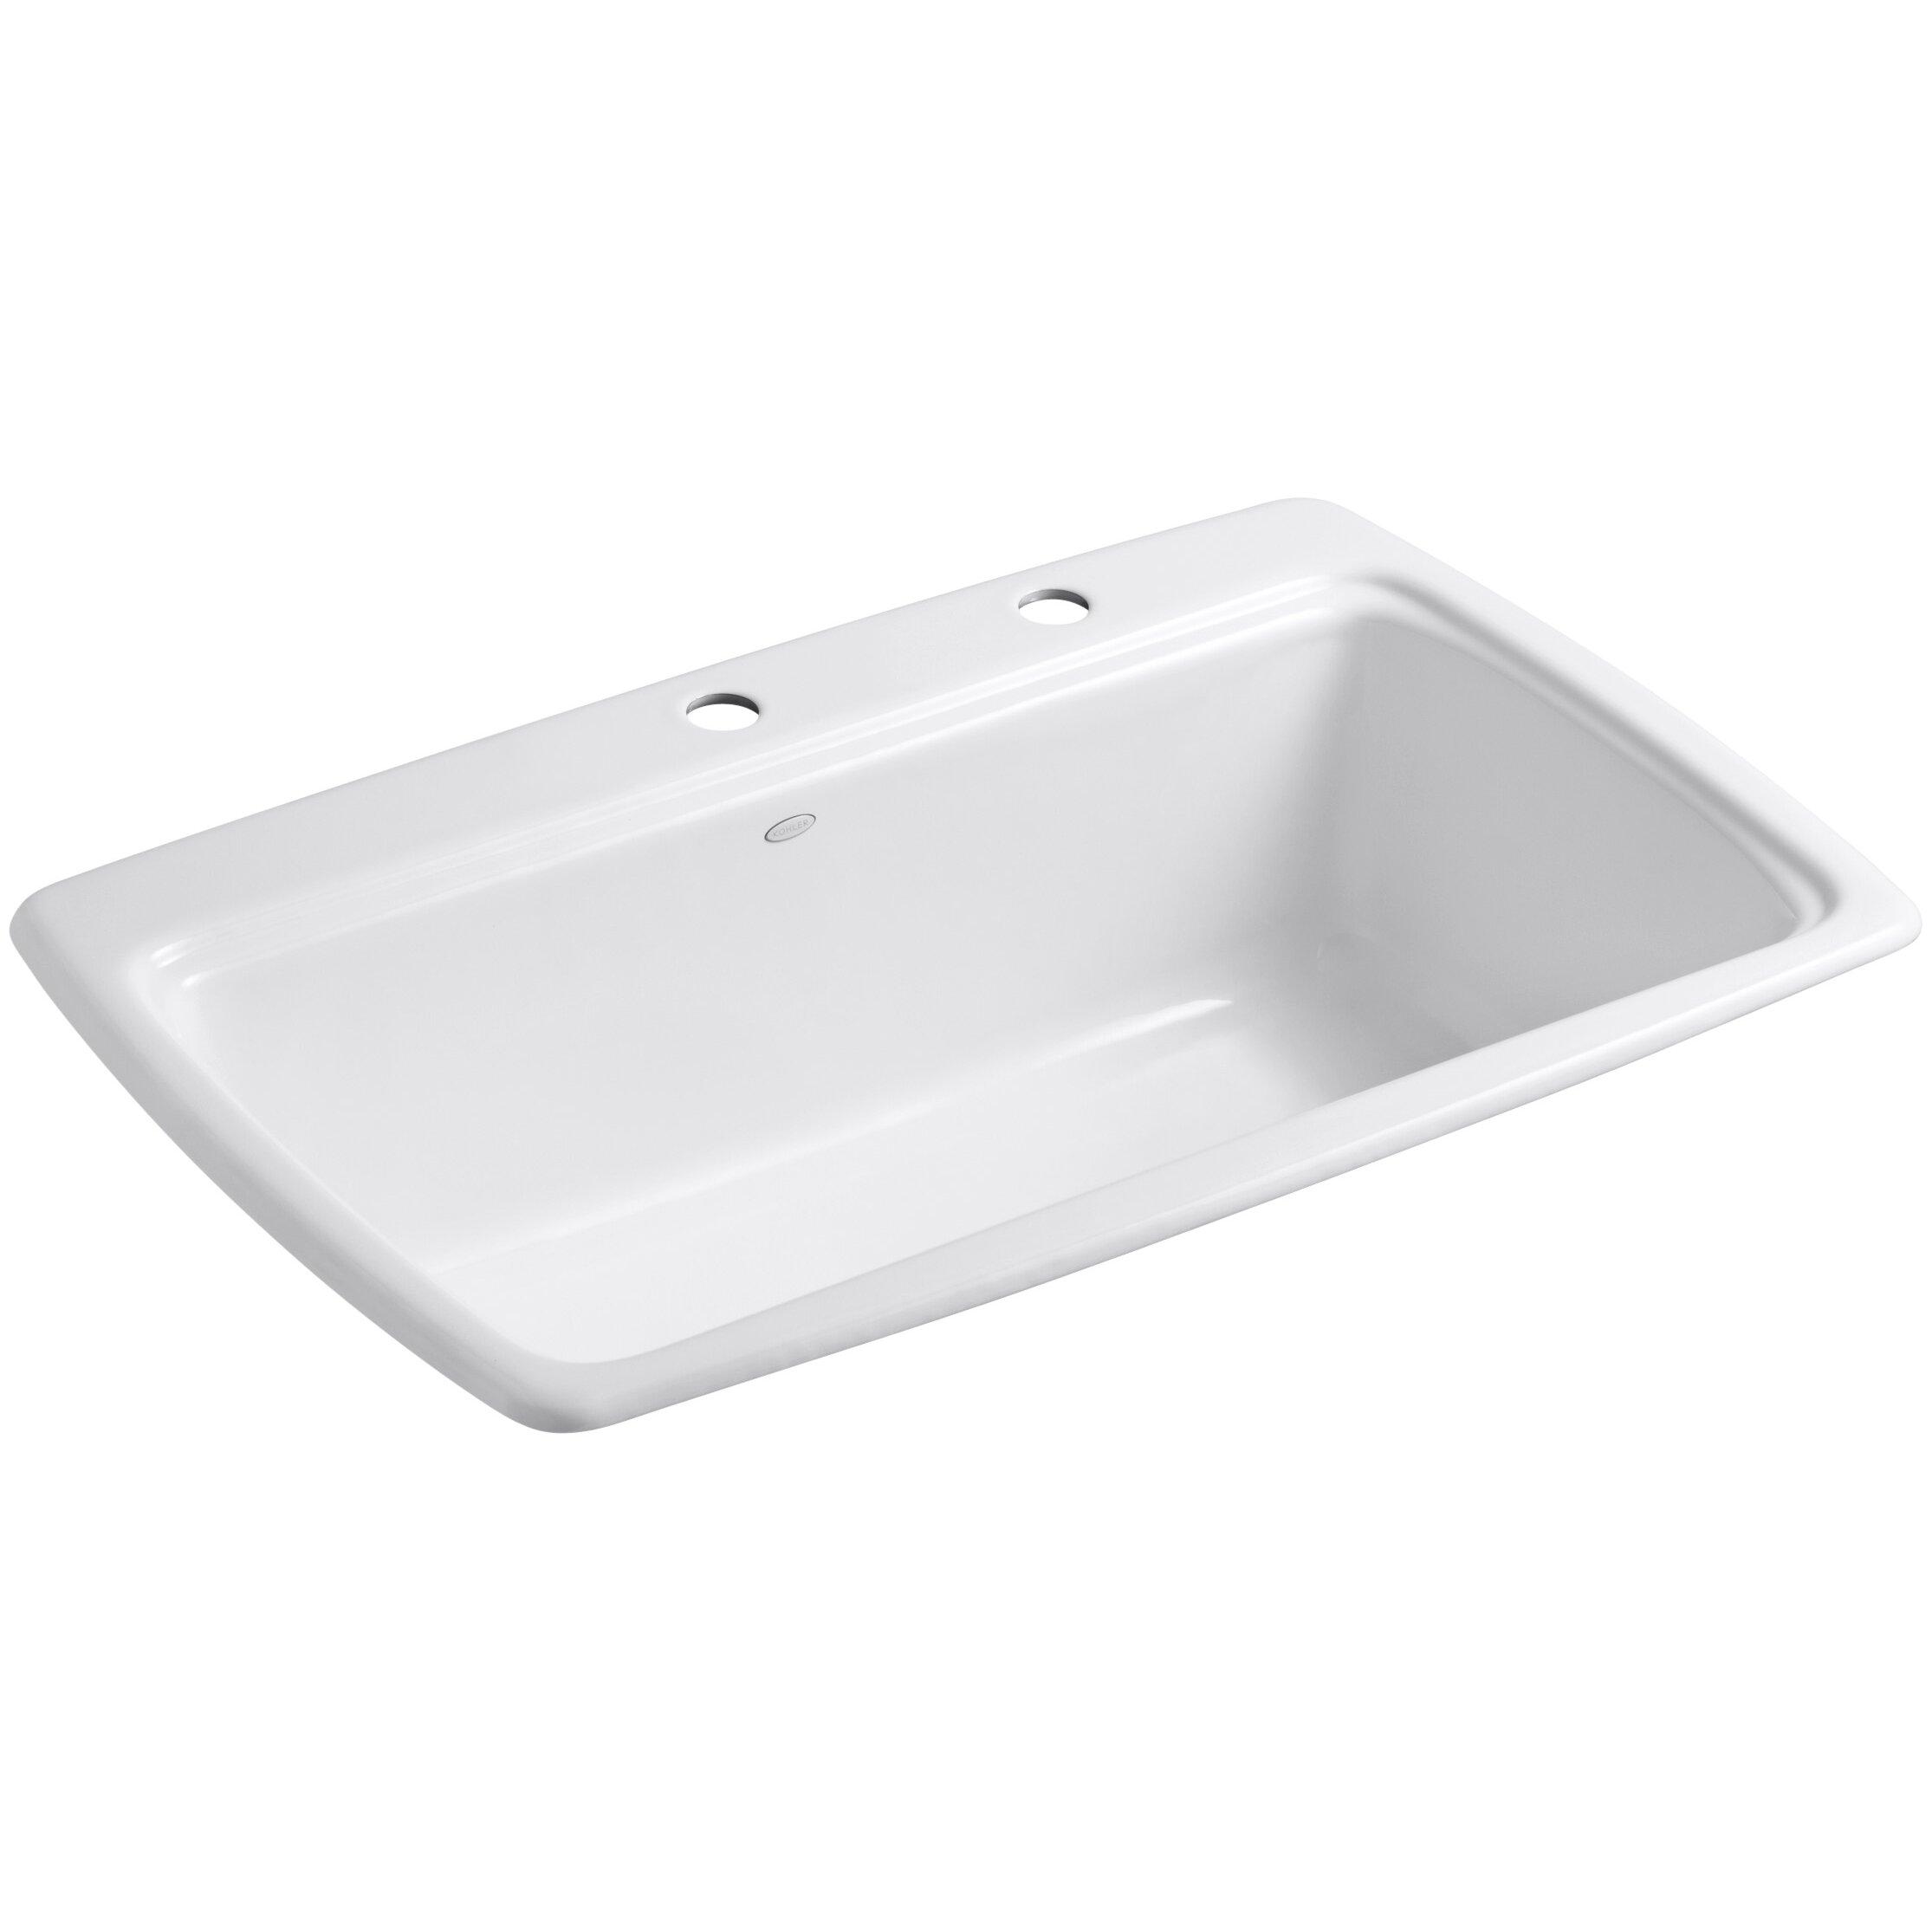 Kohler K  Self Rimming Single Bowl Kitchen Sink